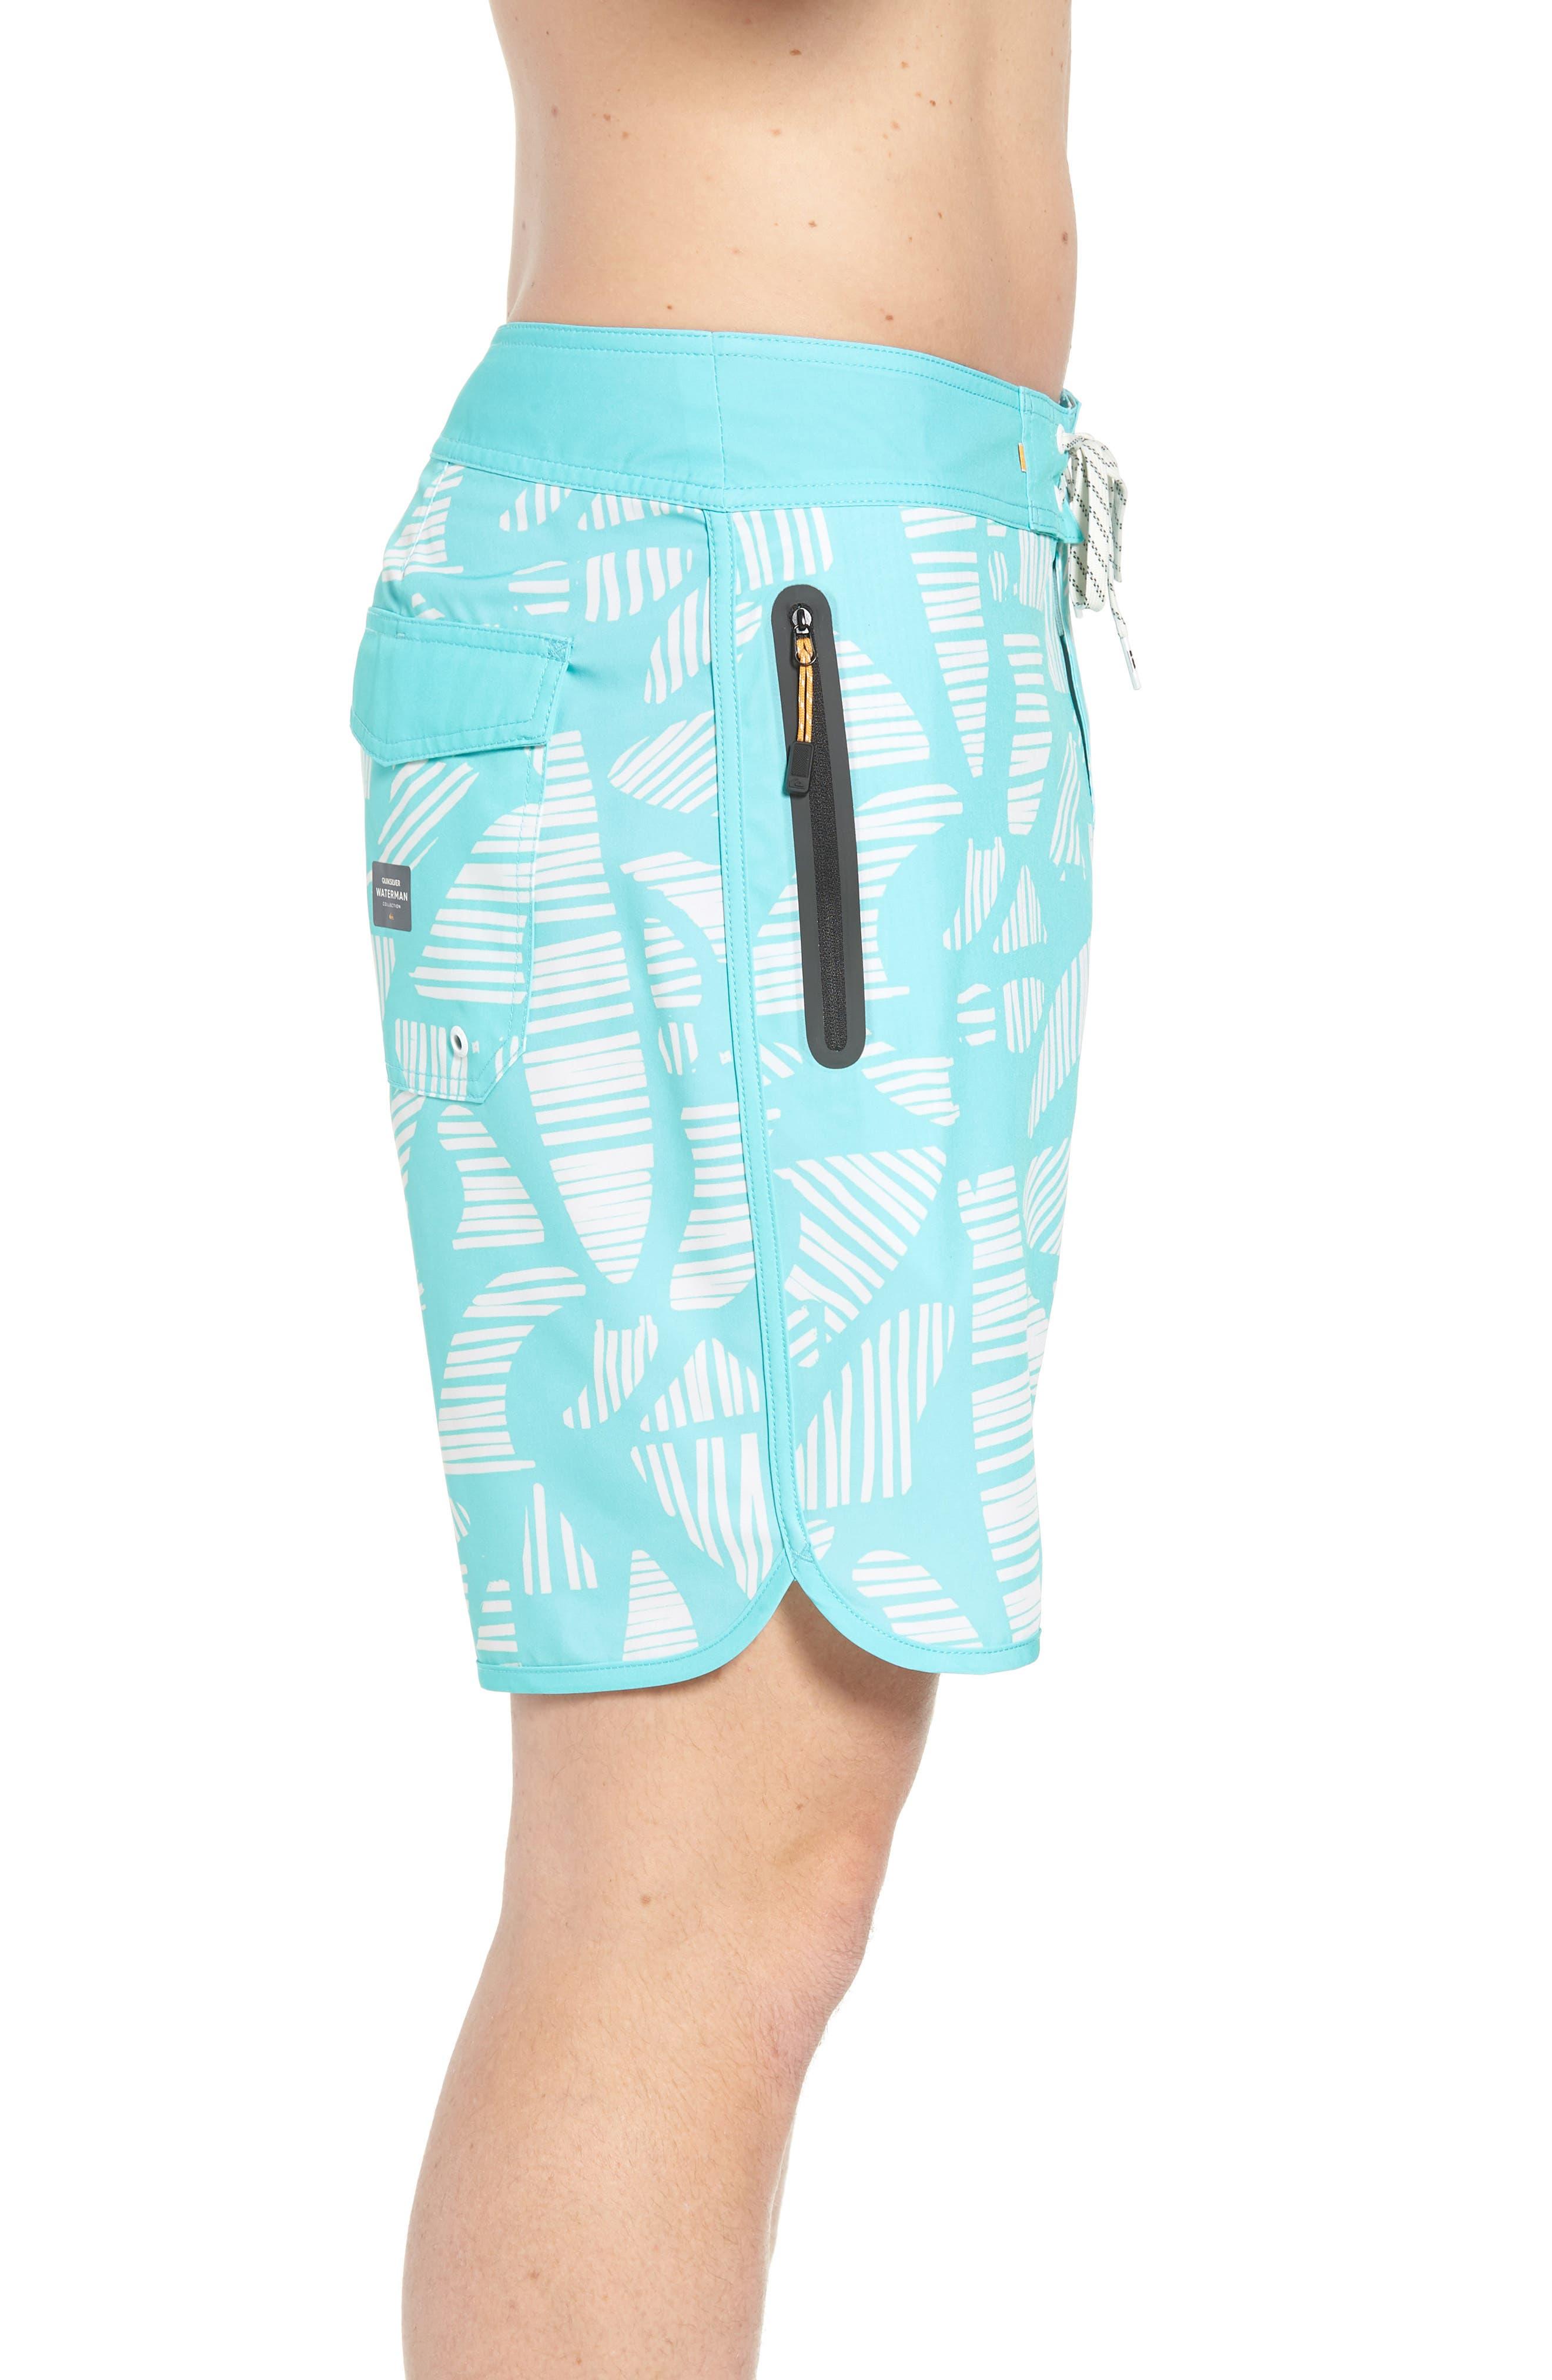 Odysea Board Shorts,                             Alternate thumbnail 3, color,                             BLUE RADIANCE